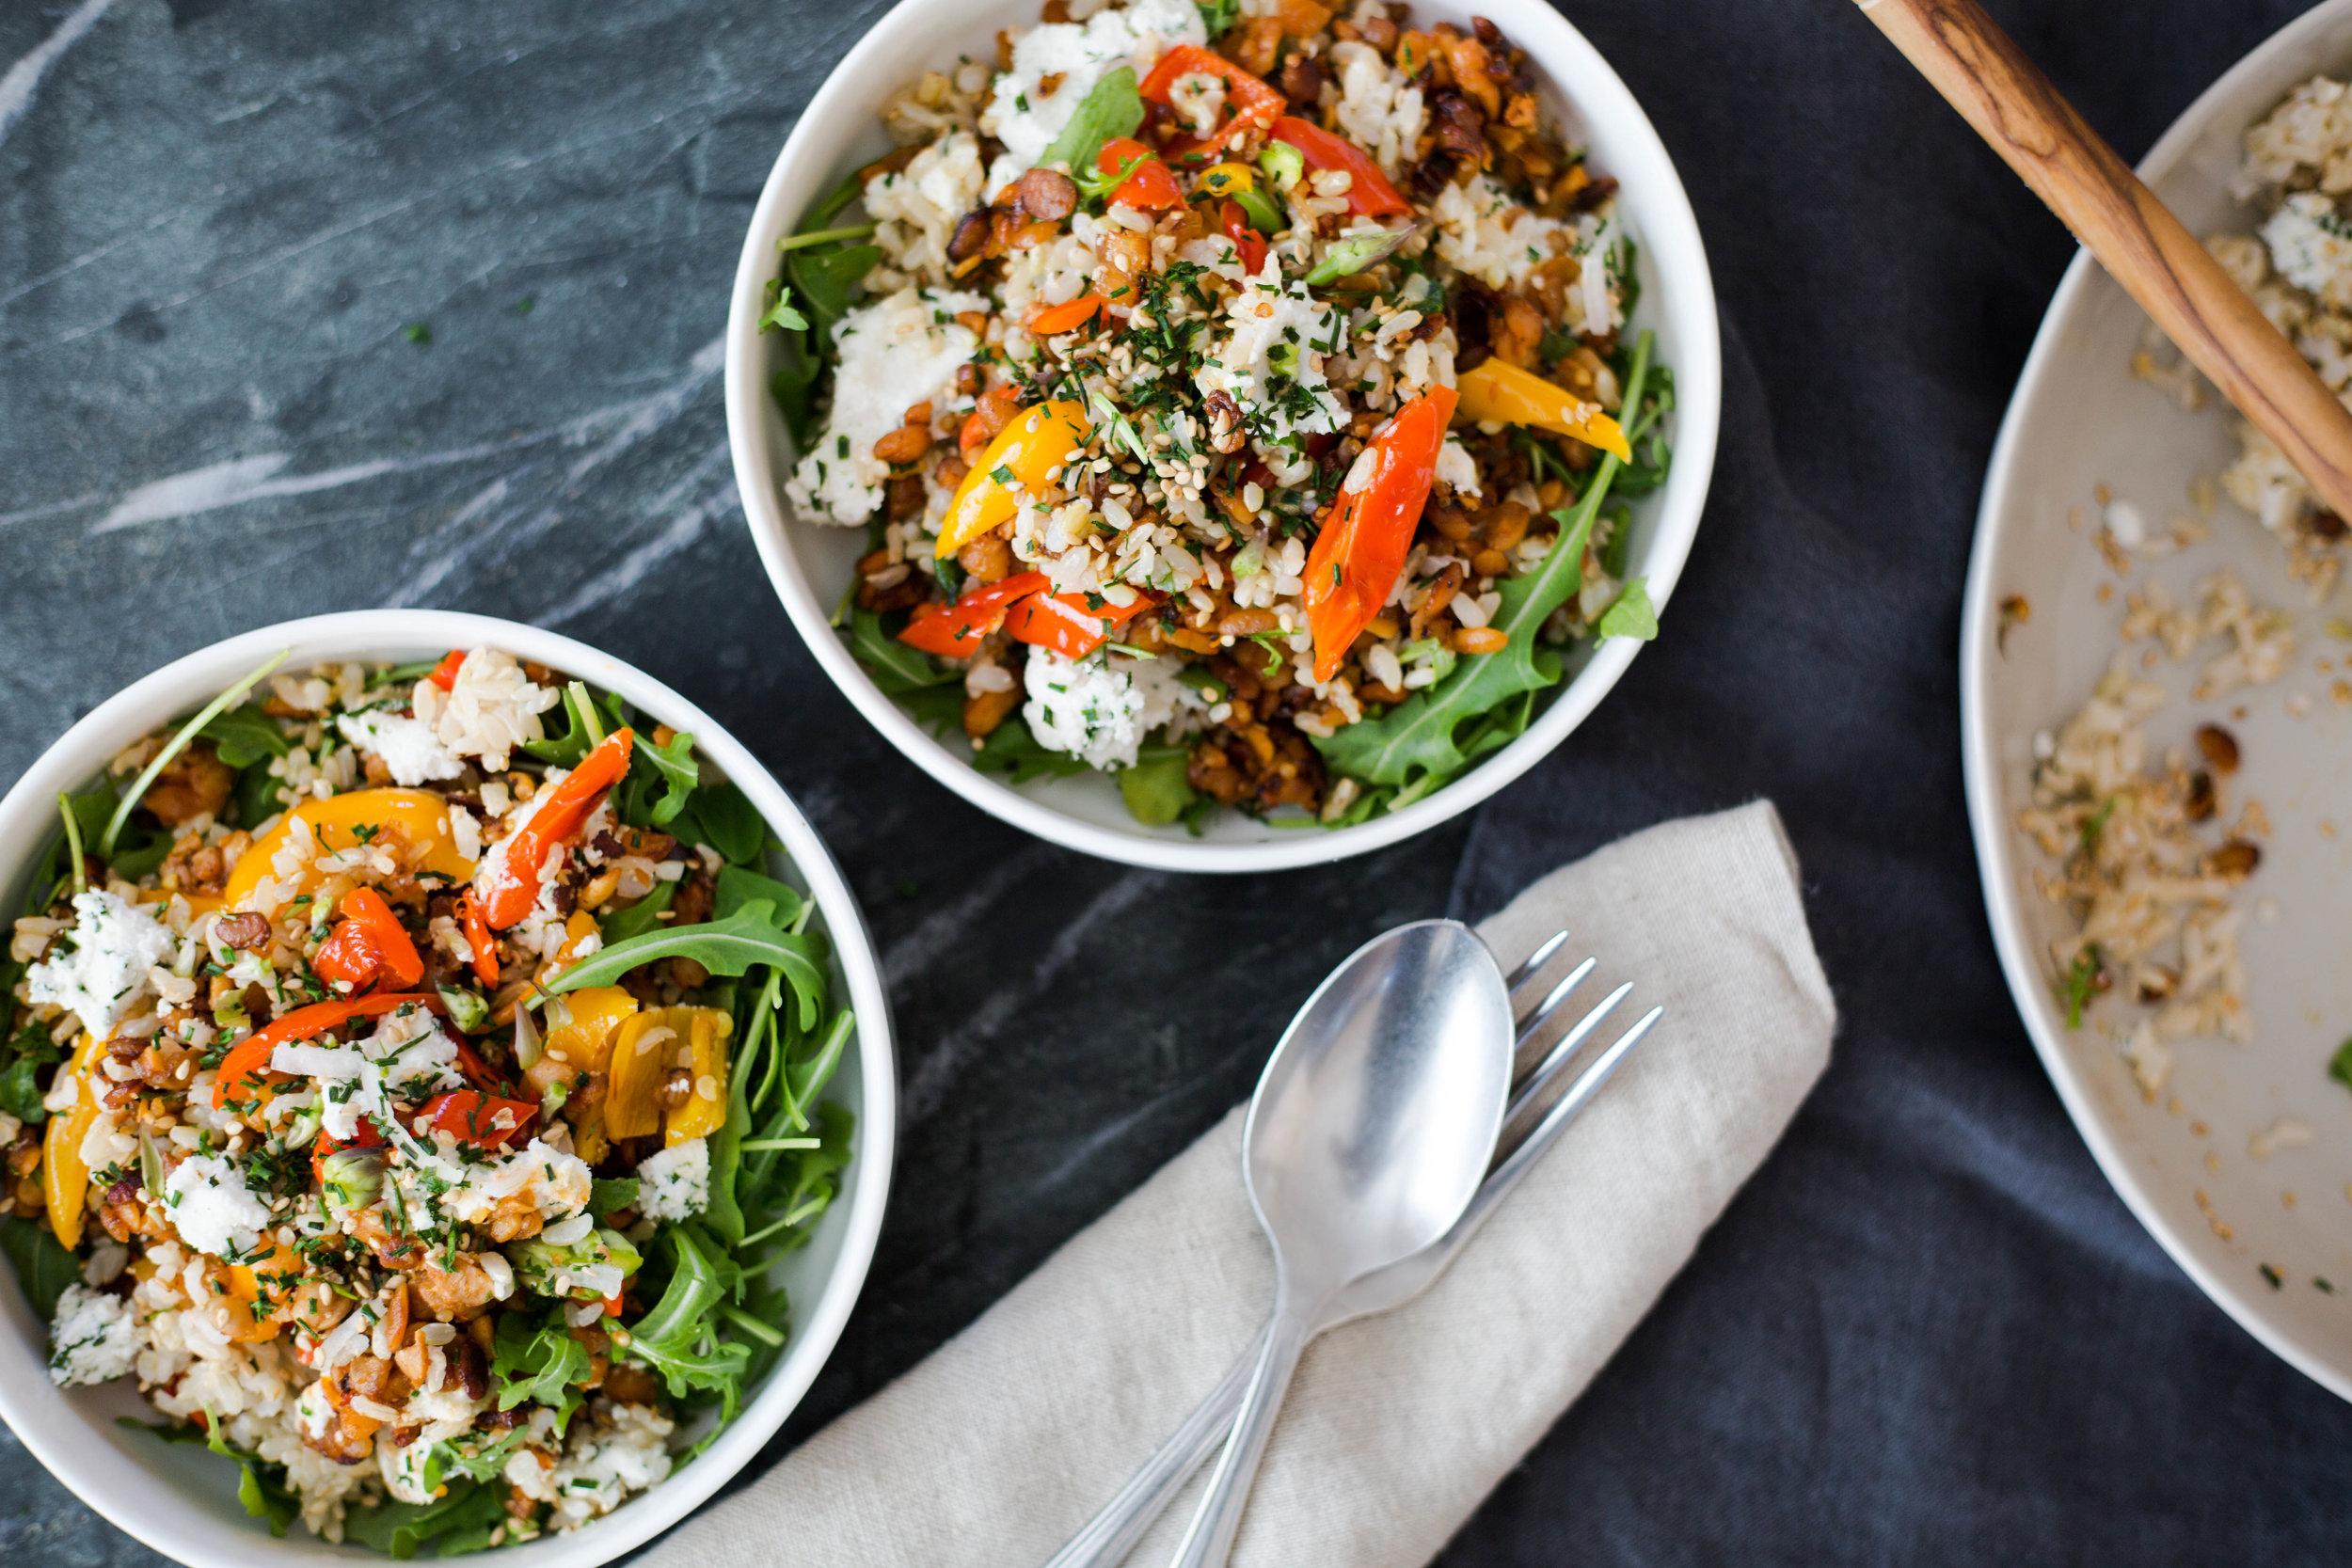 Crumbled Tempeh Salad with herbed vegan ricotta cheese | #plantbased #glutenfree #puremamas | @JuliNovotny